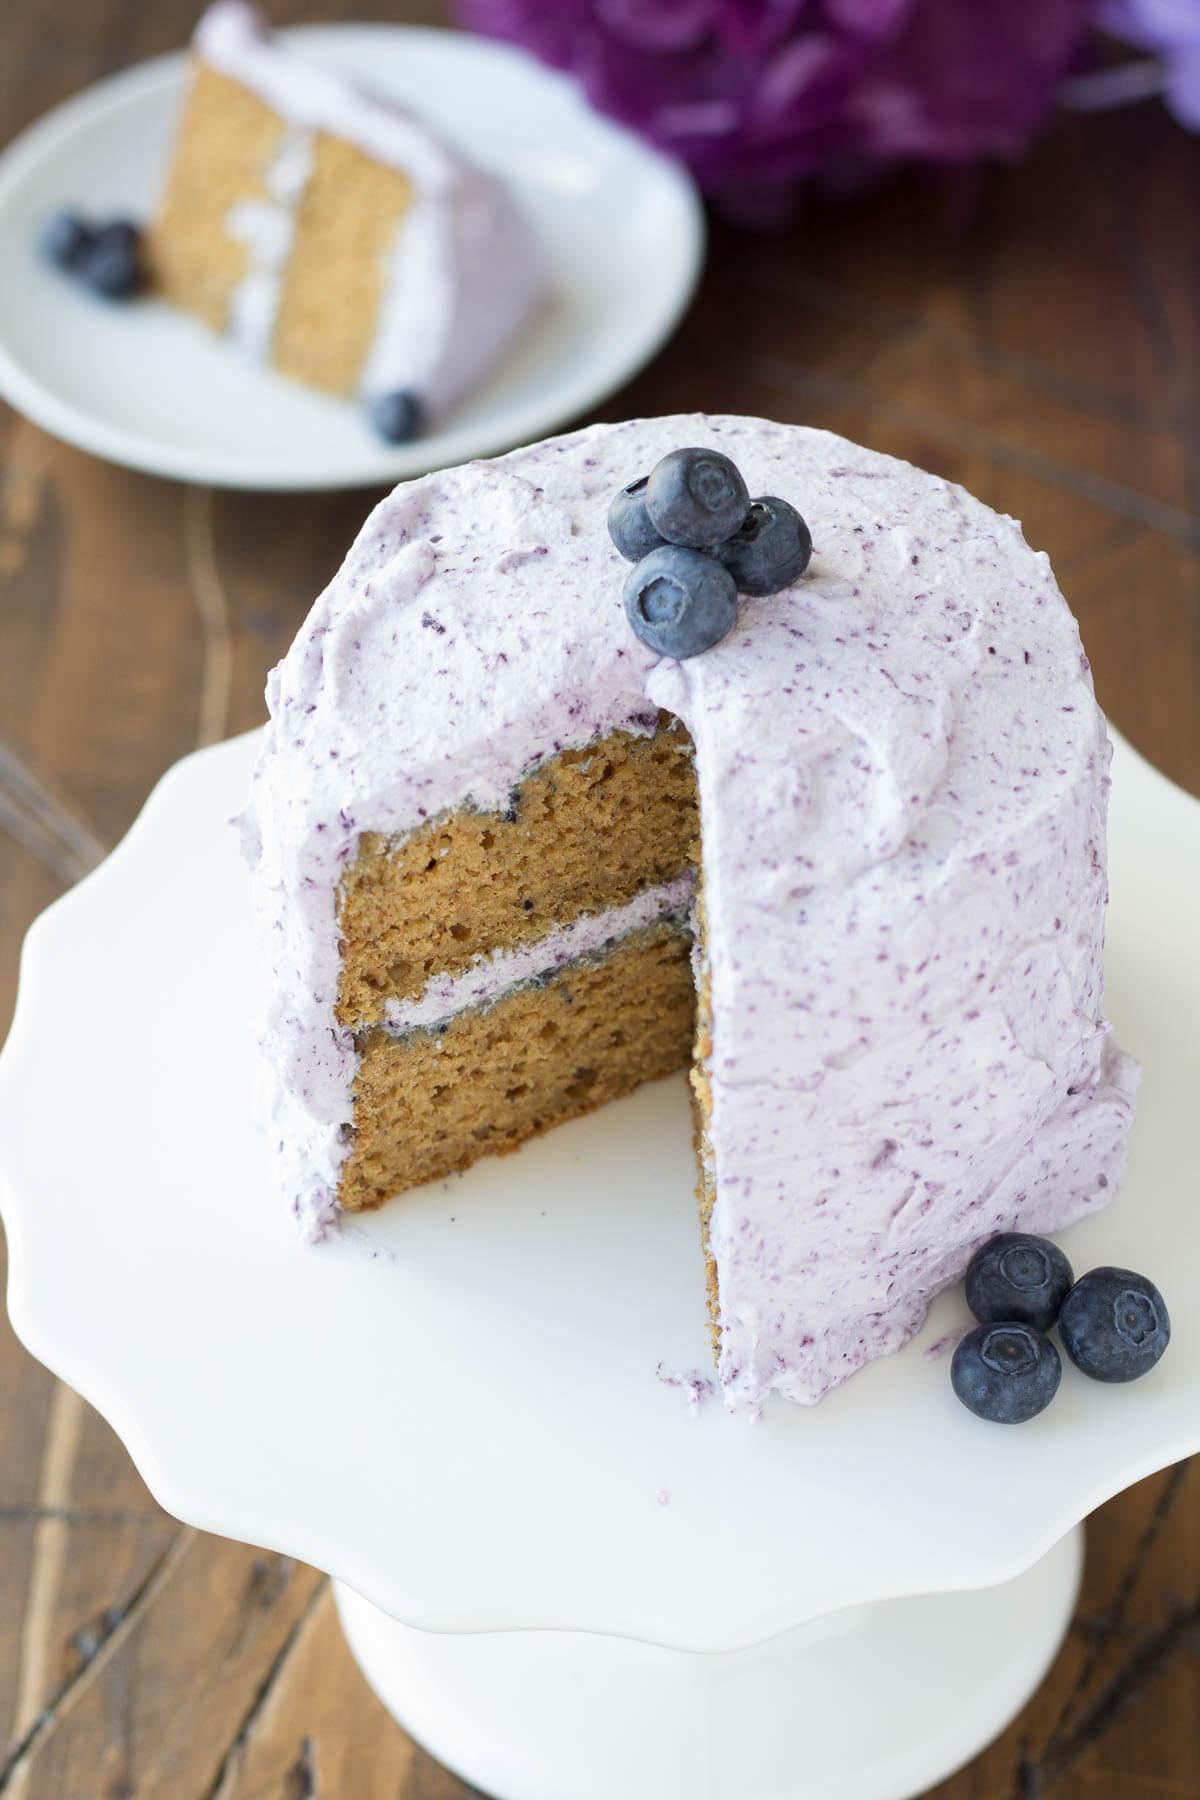 Banana blueberry smash cake recipe